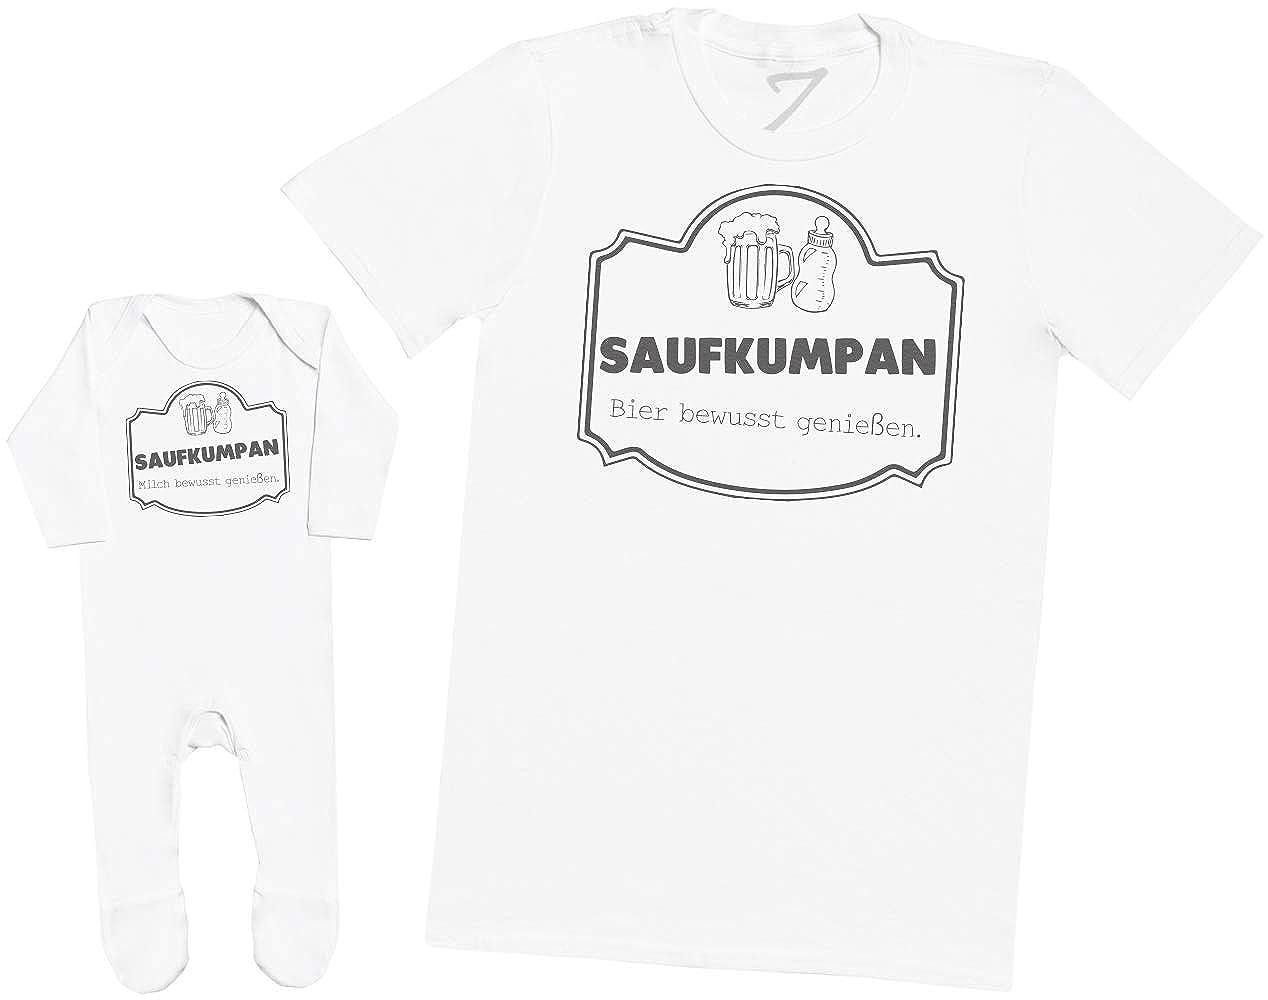 Milch bewusst genie/ßen T-Shirt /& Baby Strampler Baby Schlafanz/üge Bier bewusst genie/ßen - Passende Vater Baby Geschenkset Saufkumpan